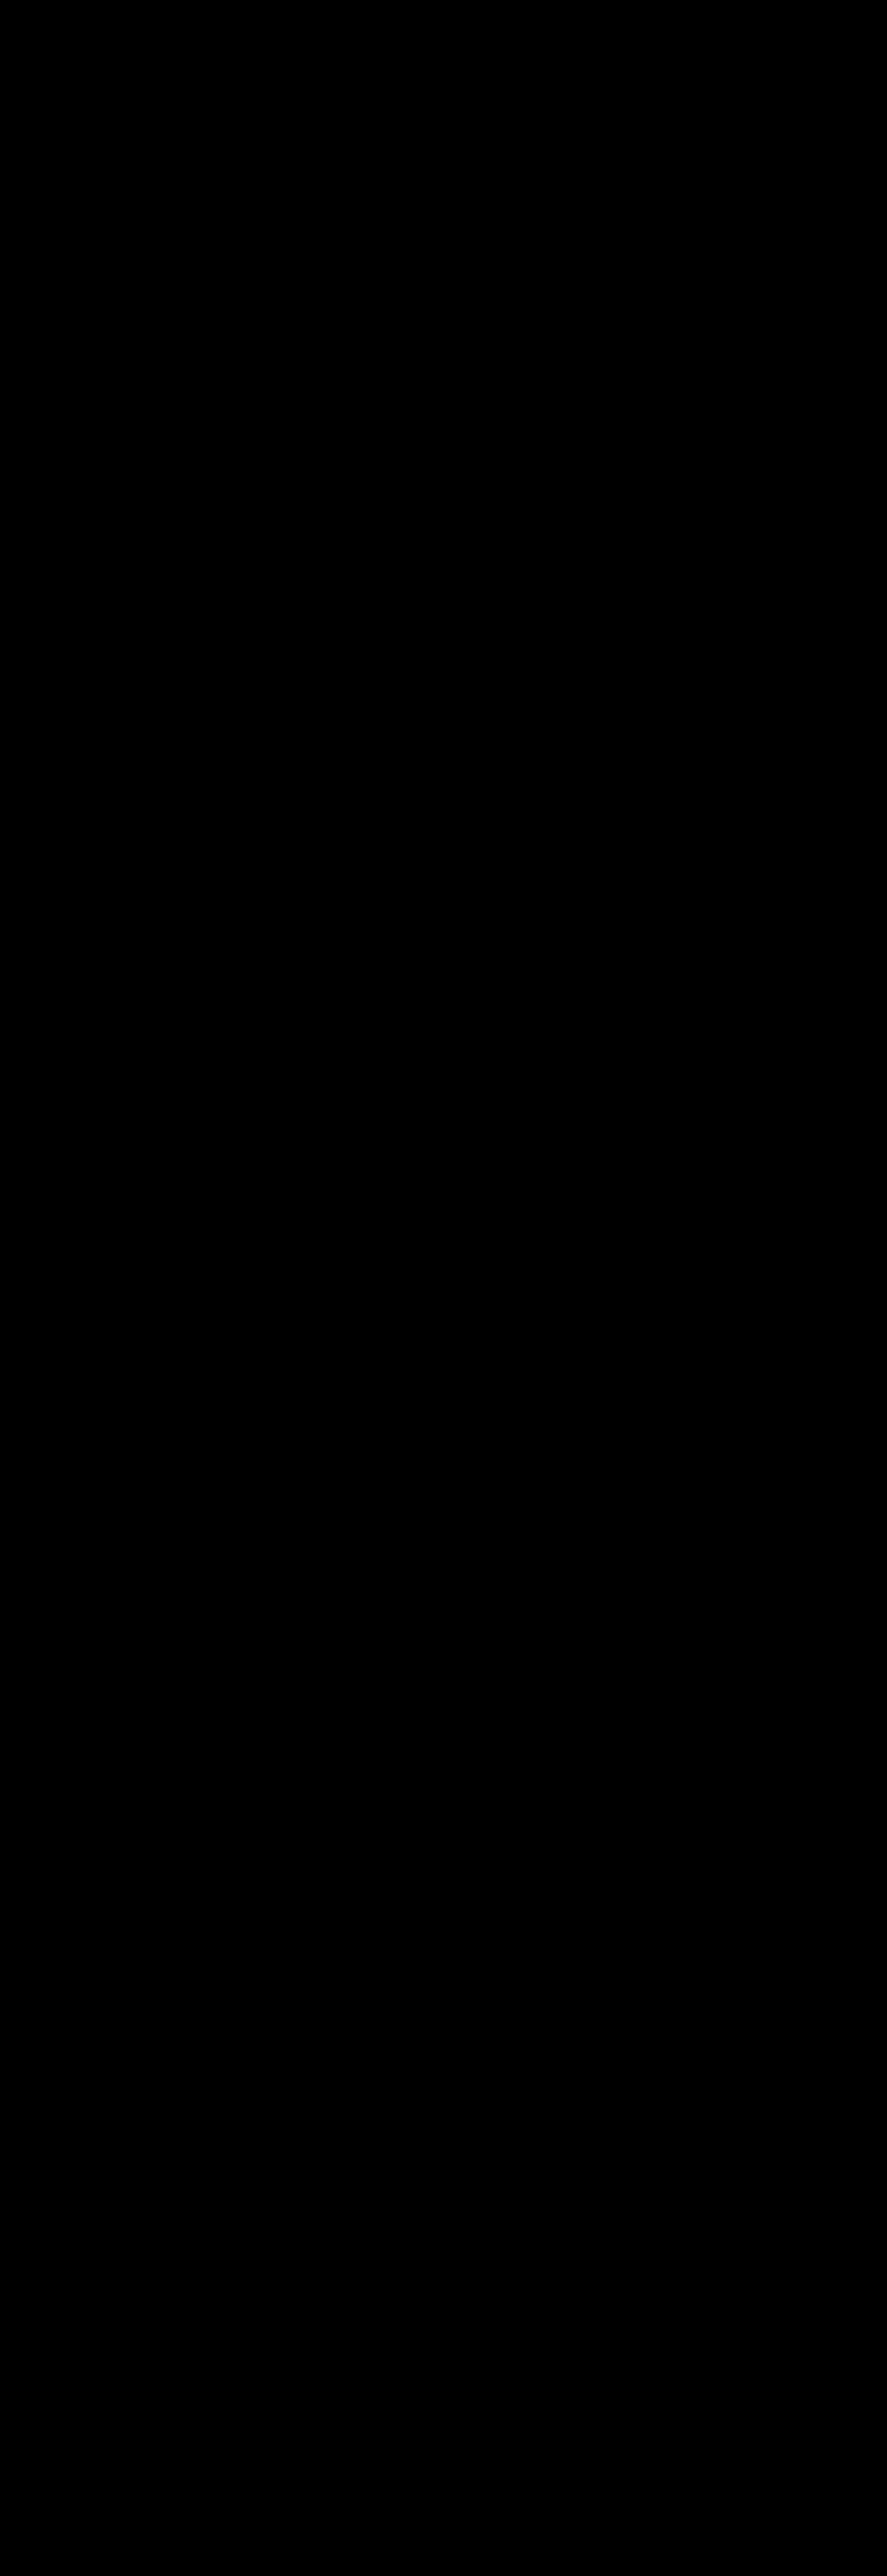 1000x2905 Filesilhouette.svg